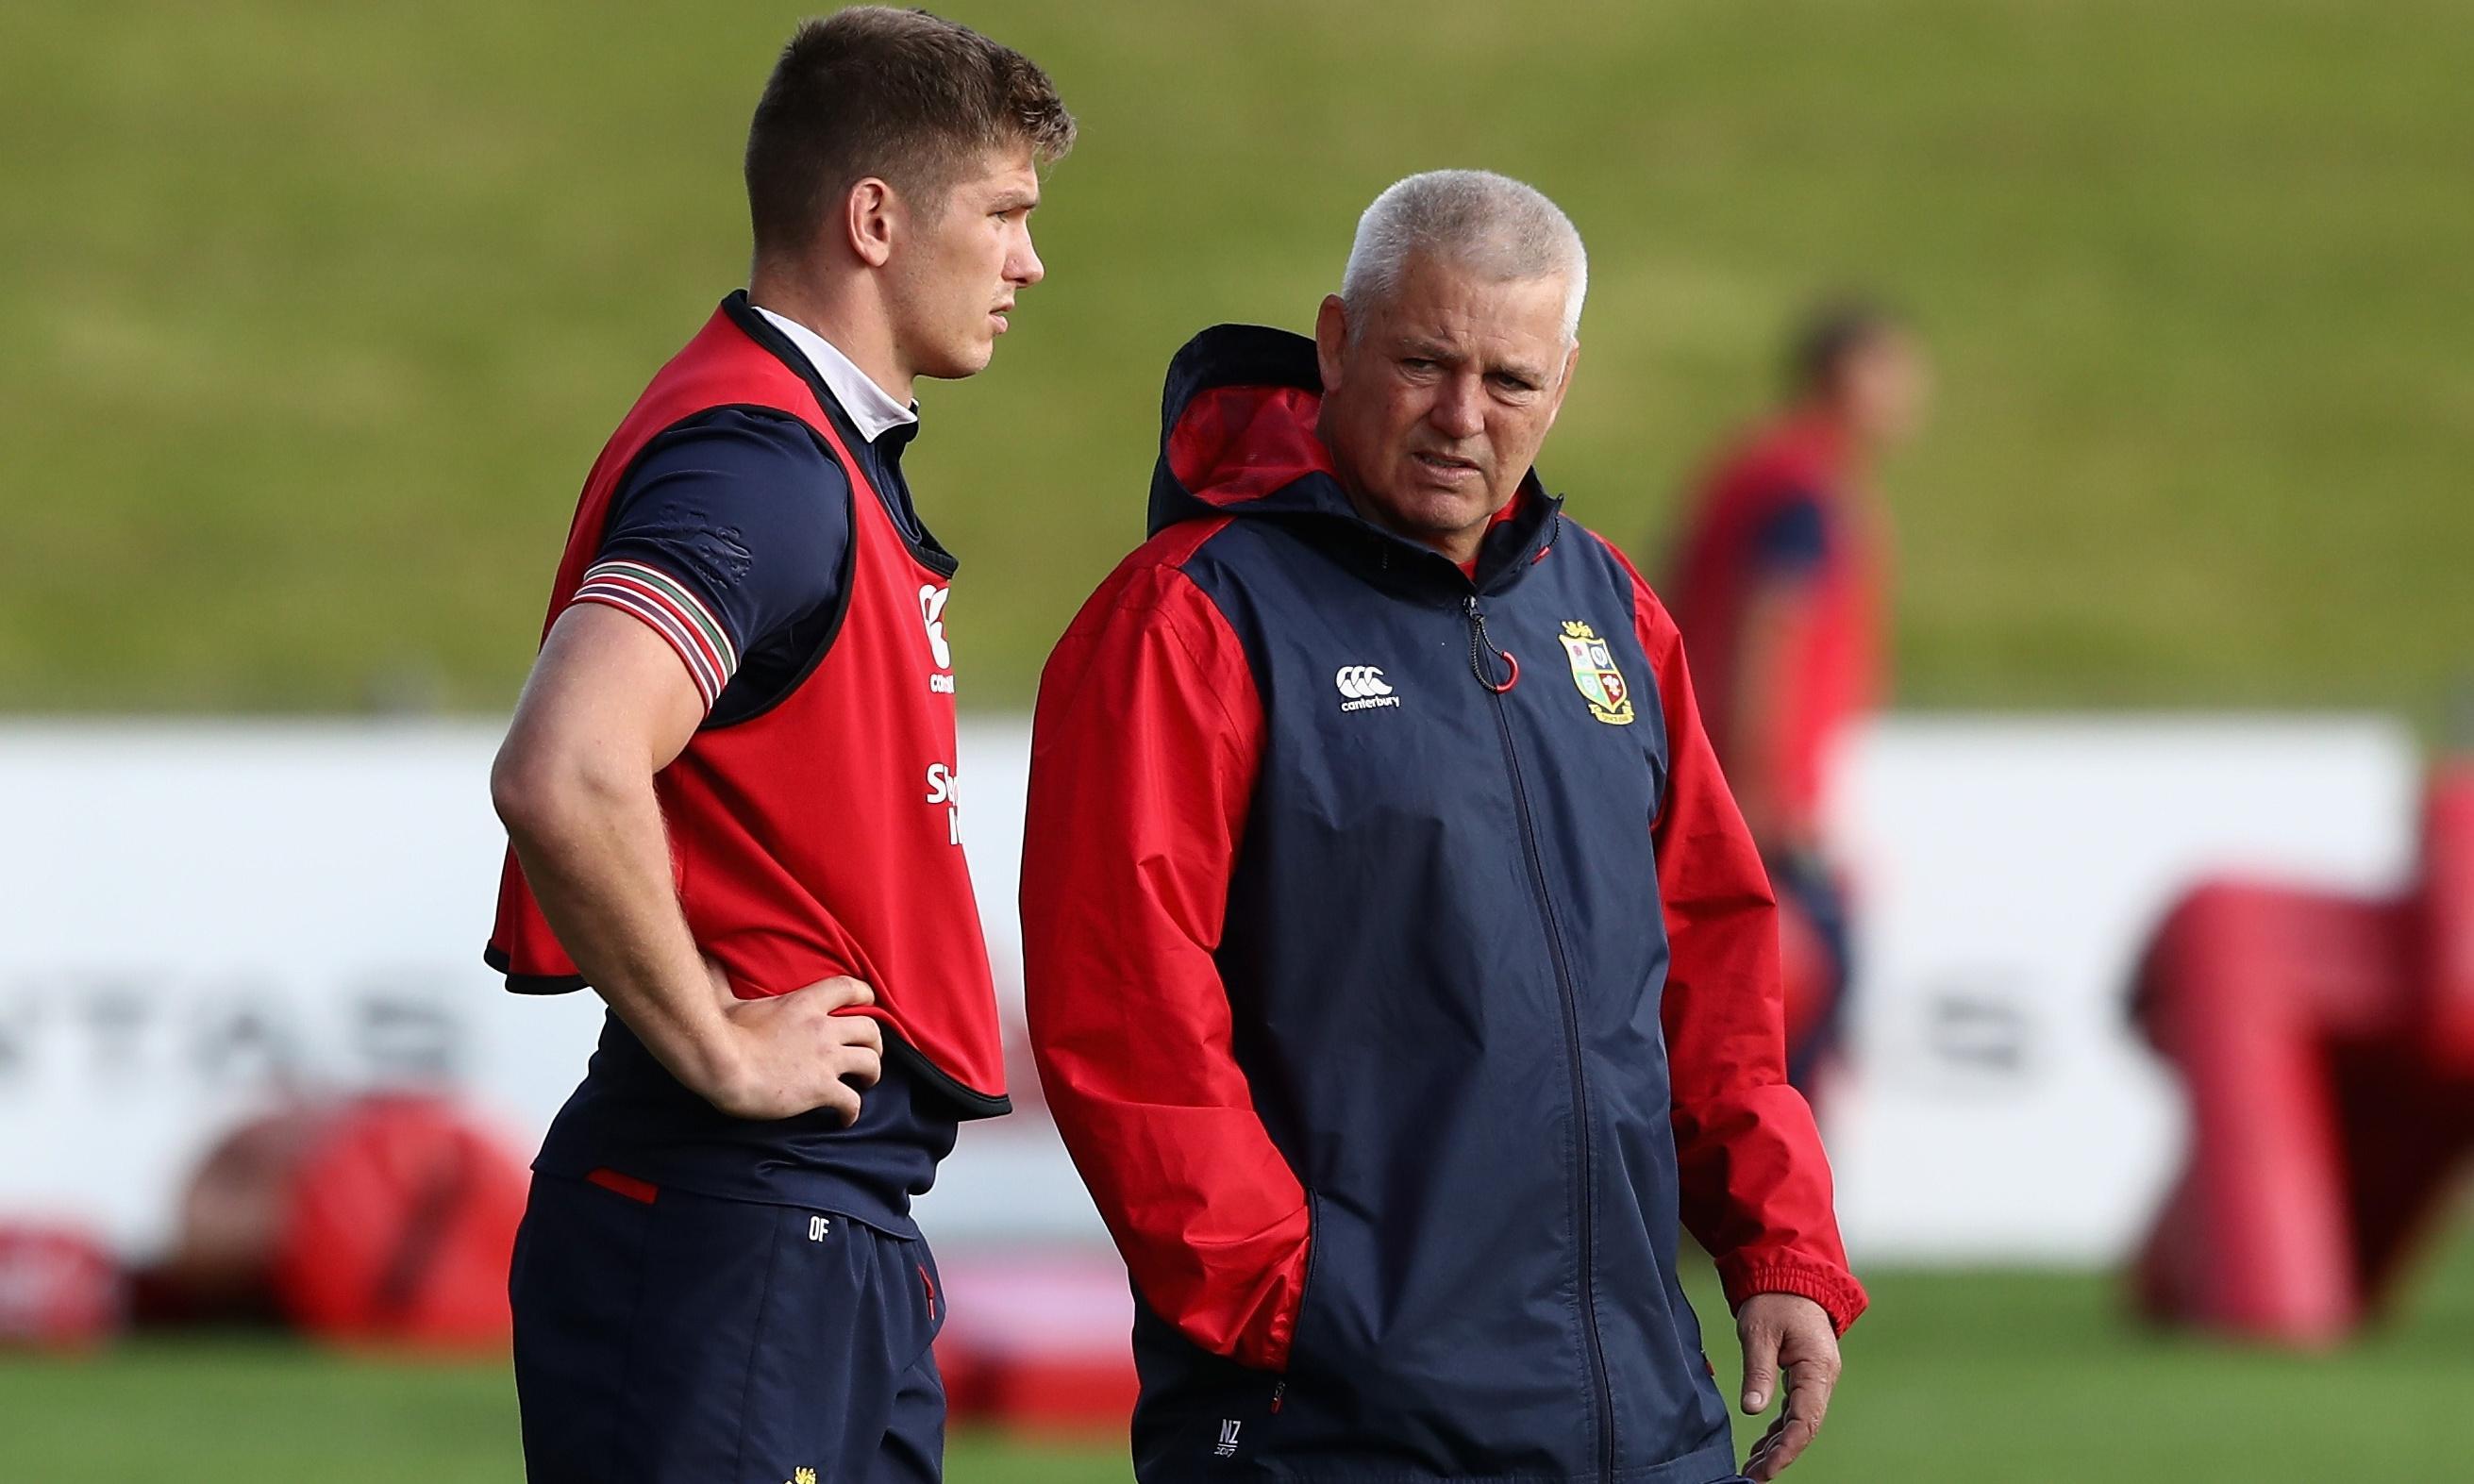 Warren Gatland set to return as Lions coach for 2021 South Africa series